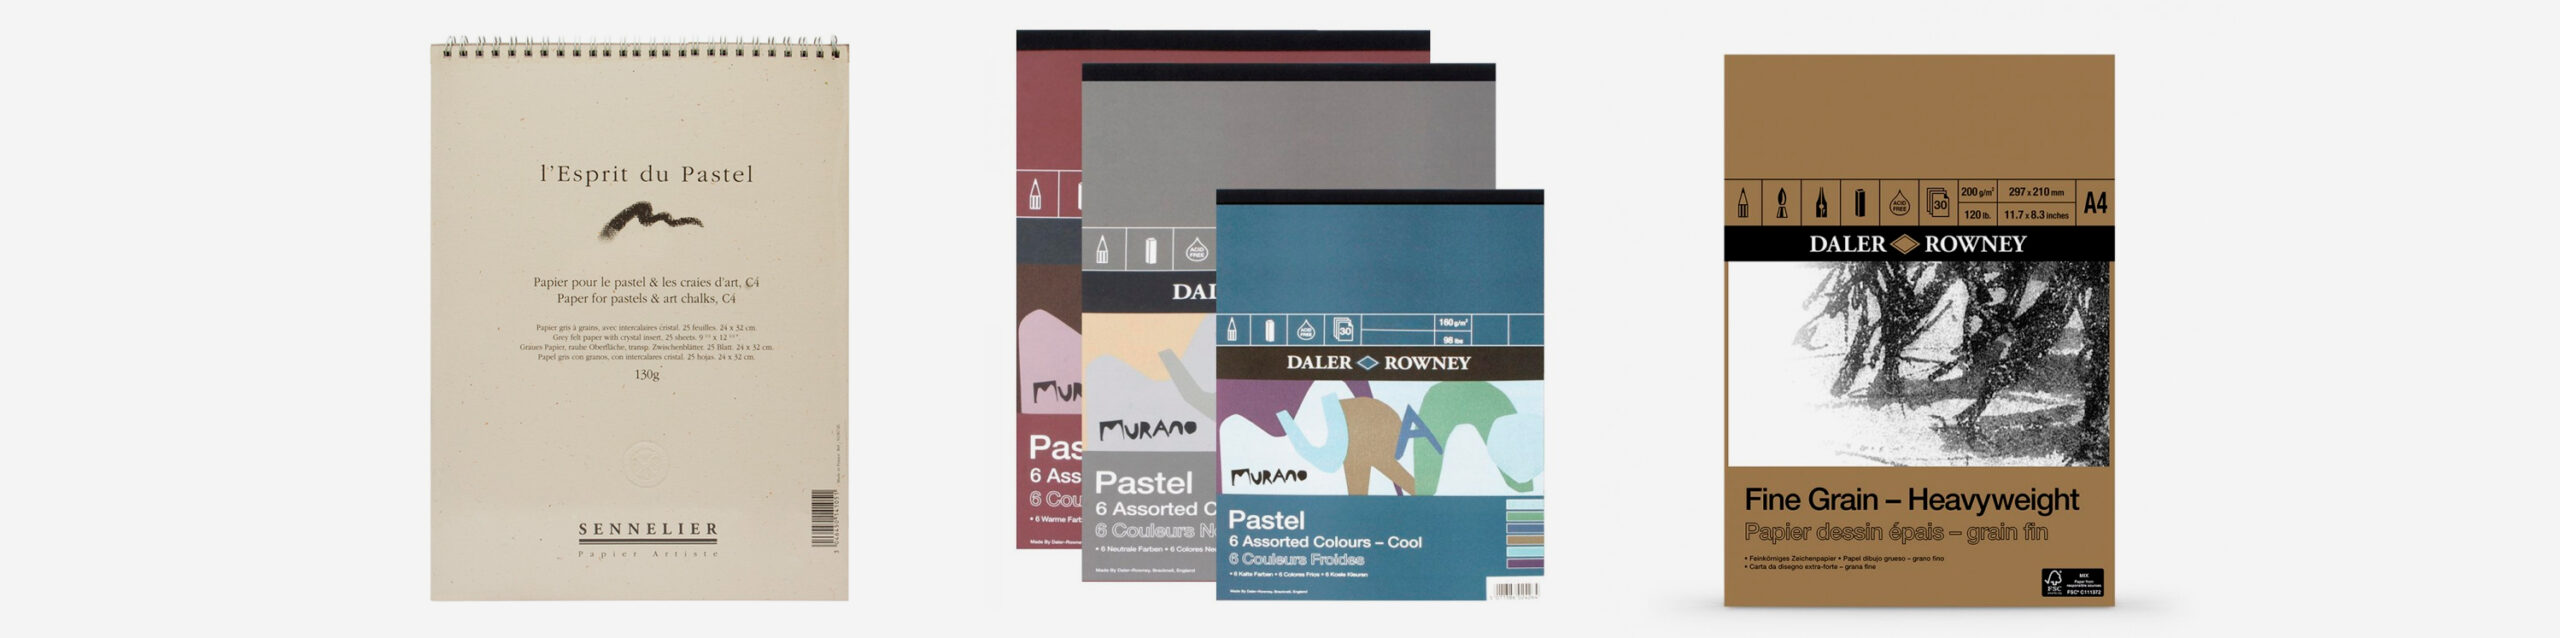 L-R: Sennelier Soft Pastel pad 32 x 24 cm, assorted Daler Rowney Murano Pastel pads, Daler Rowney Fine Grain Heavyweight cartridge pad A4